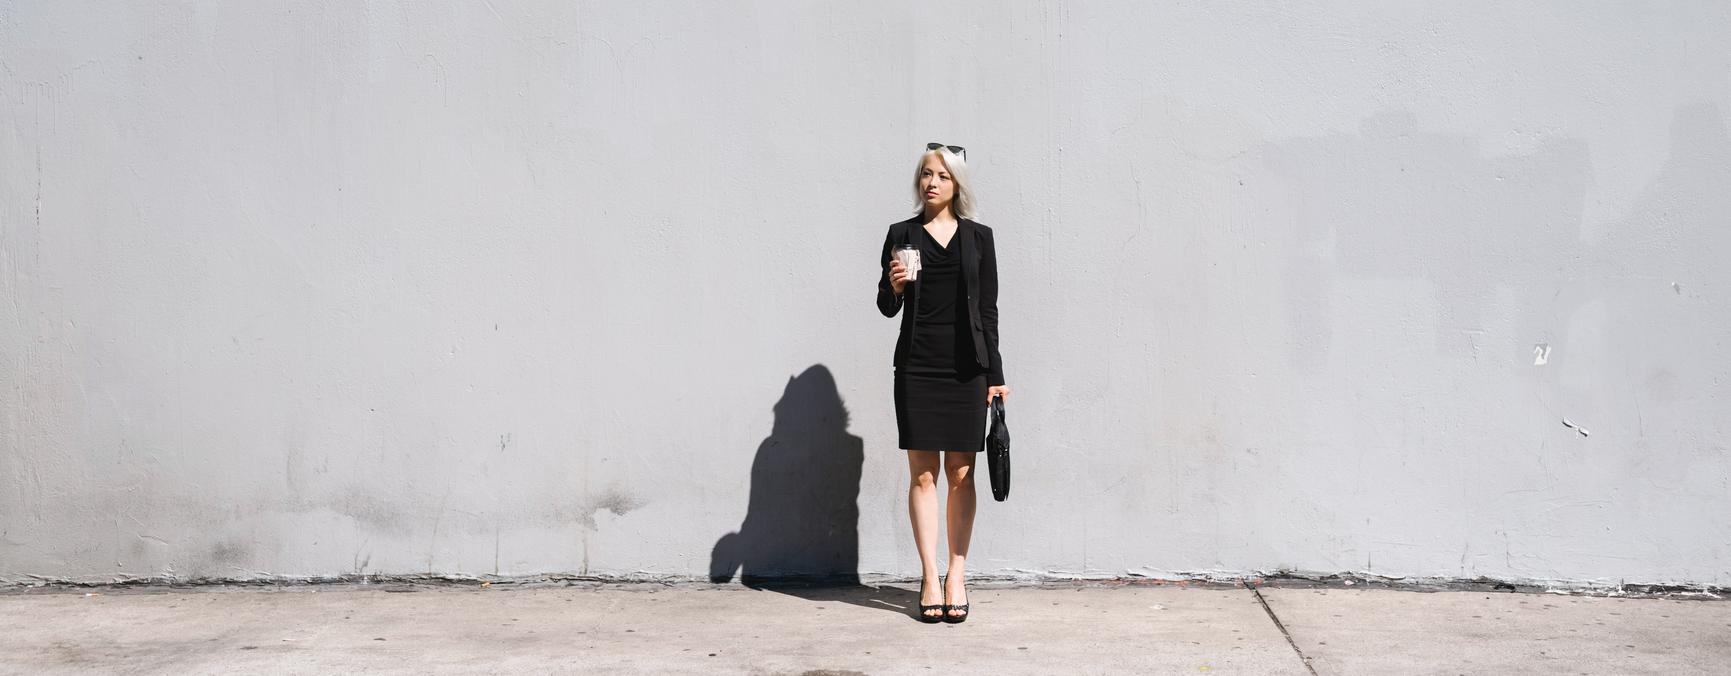 Simone Becchetti / Stocksy